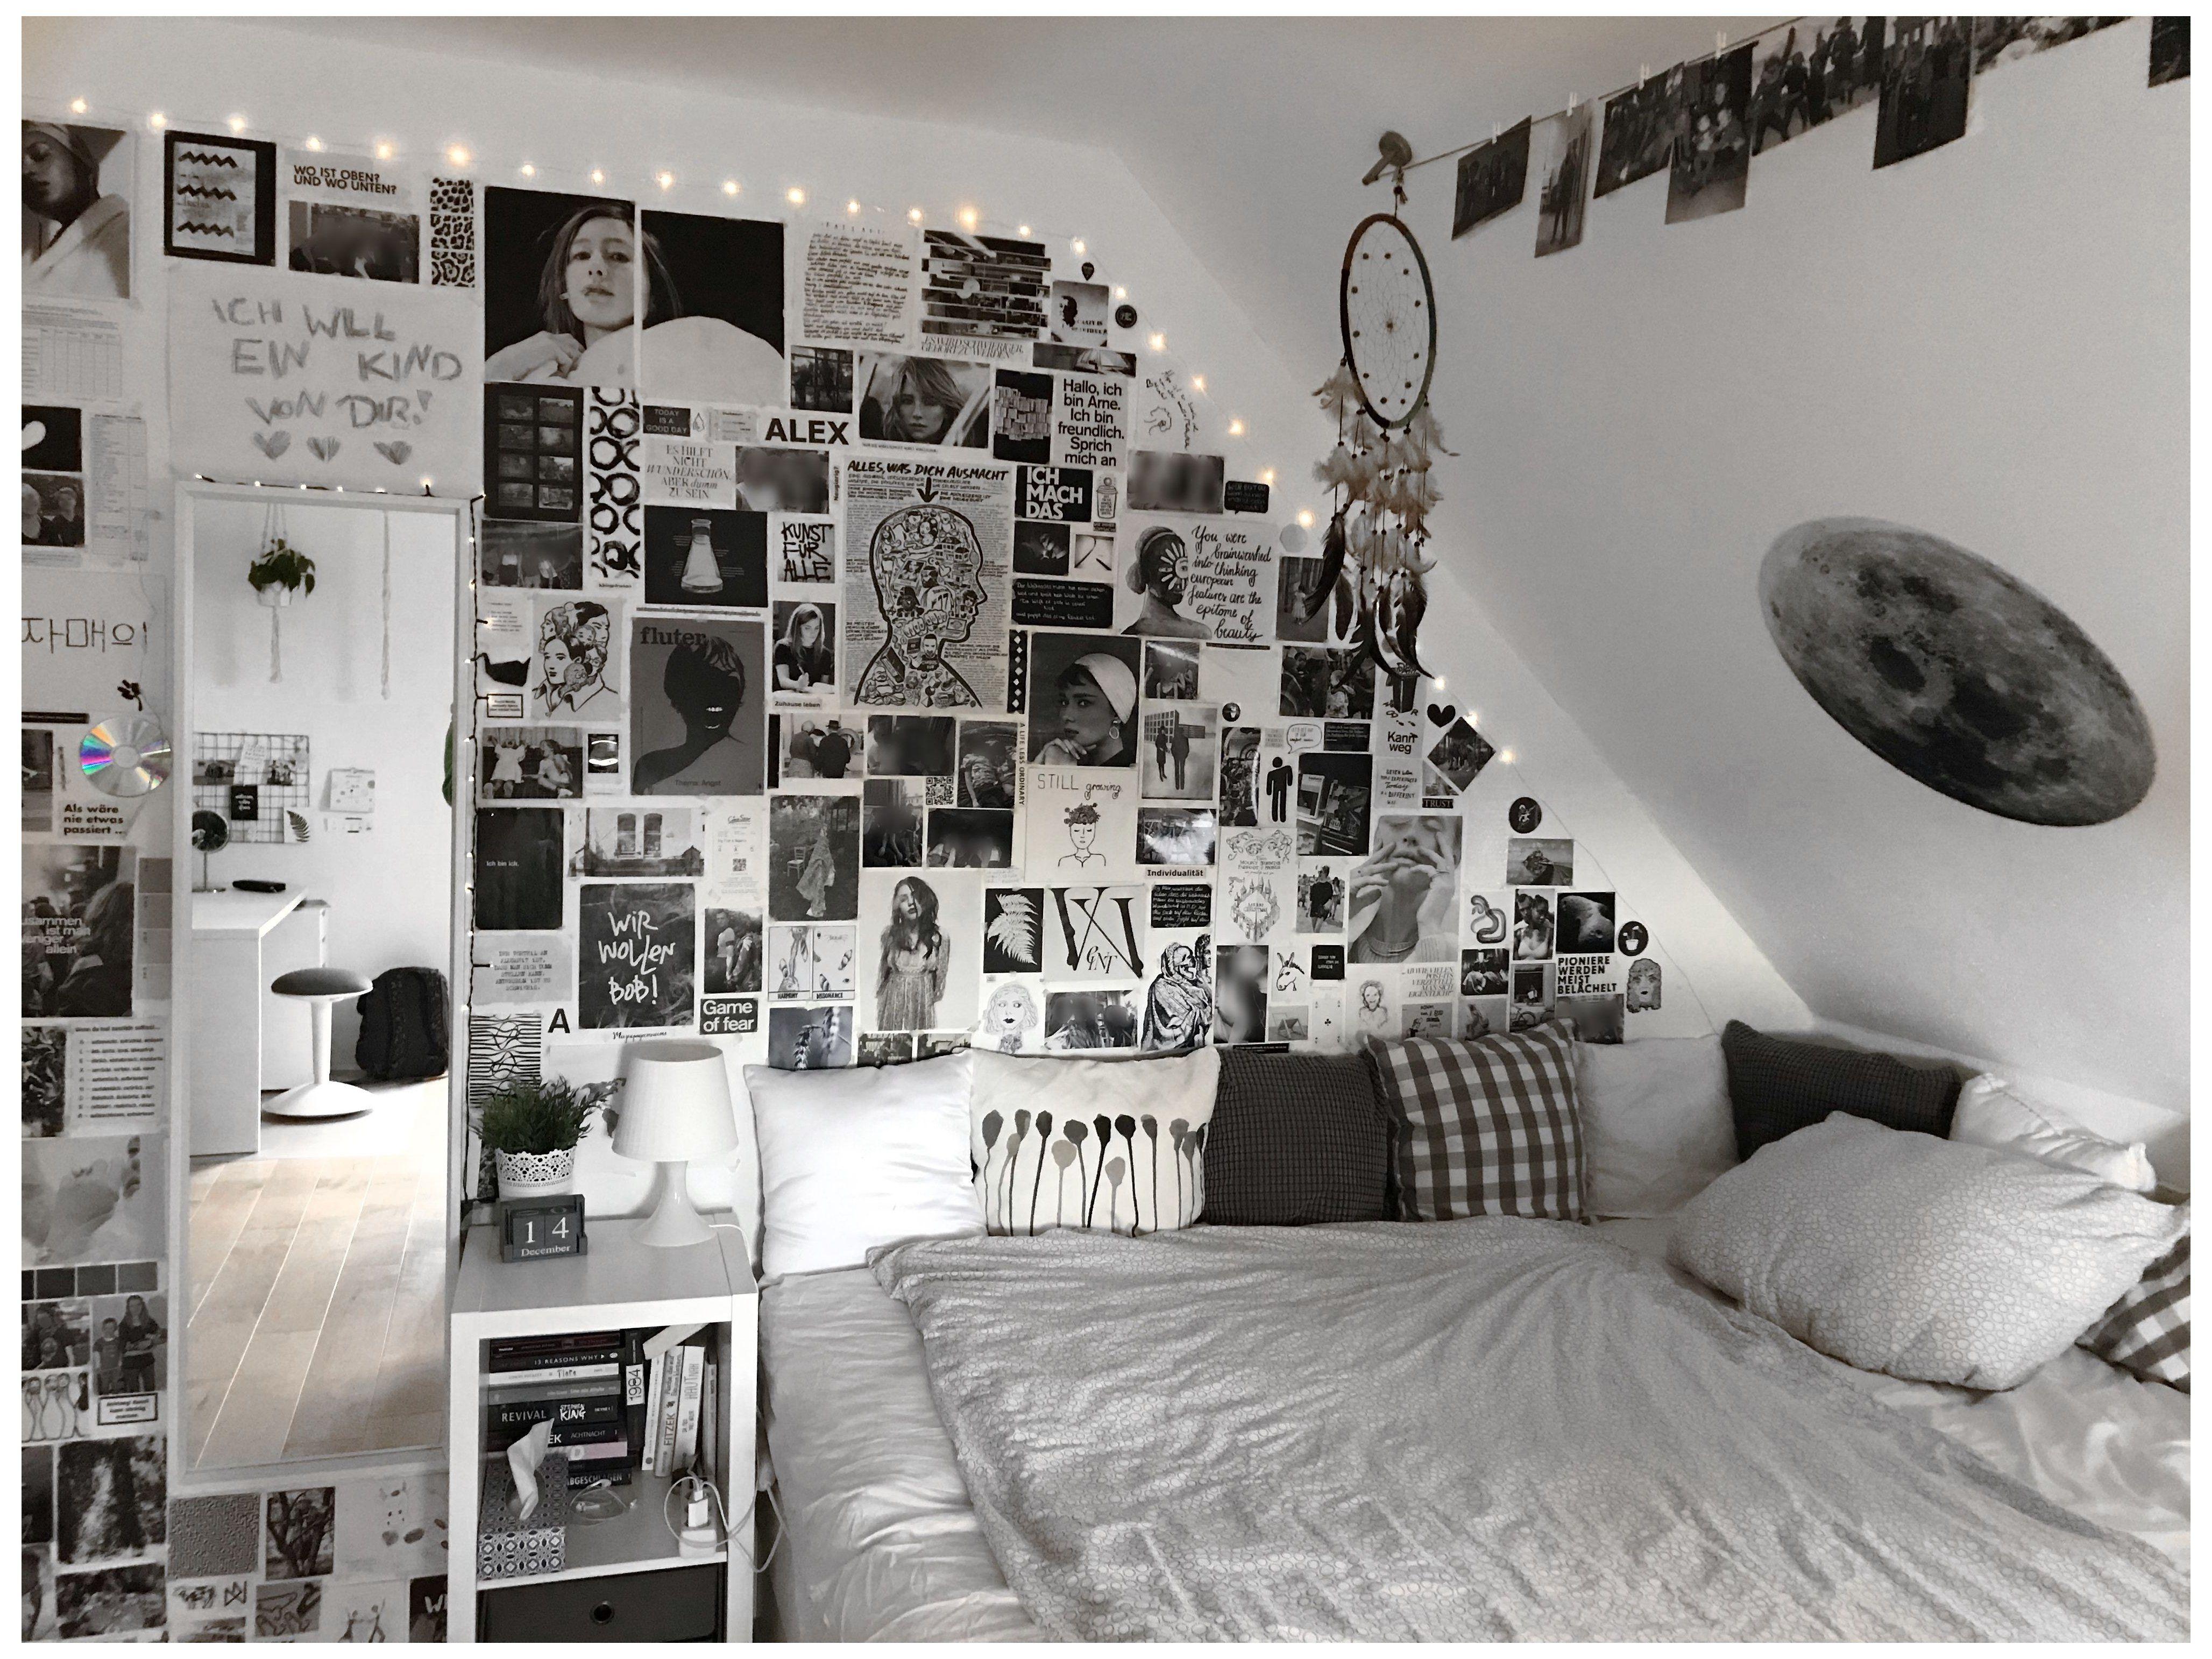 Pin By Katelyn On K N Apartment In 2021 White Room Decor Black Room Decor Aesthetic Bedroom